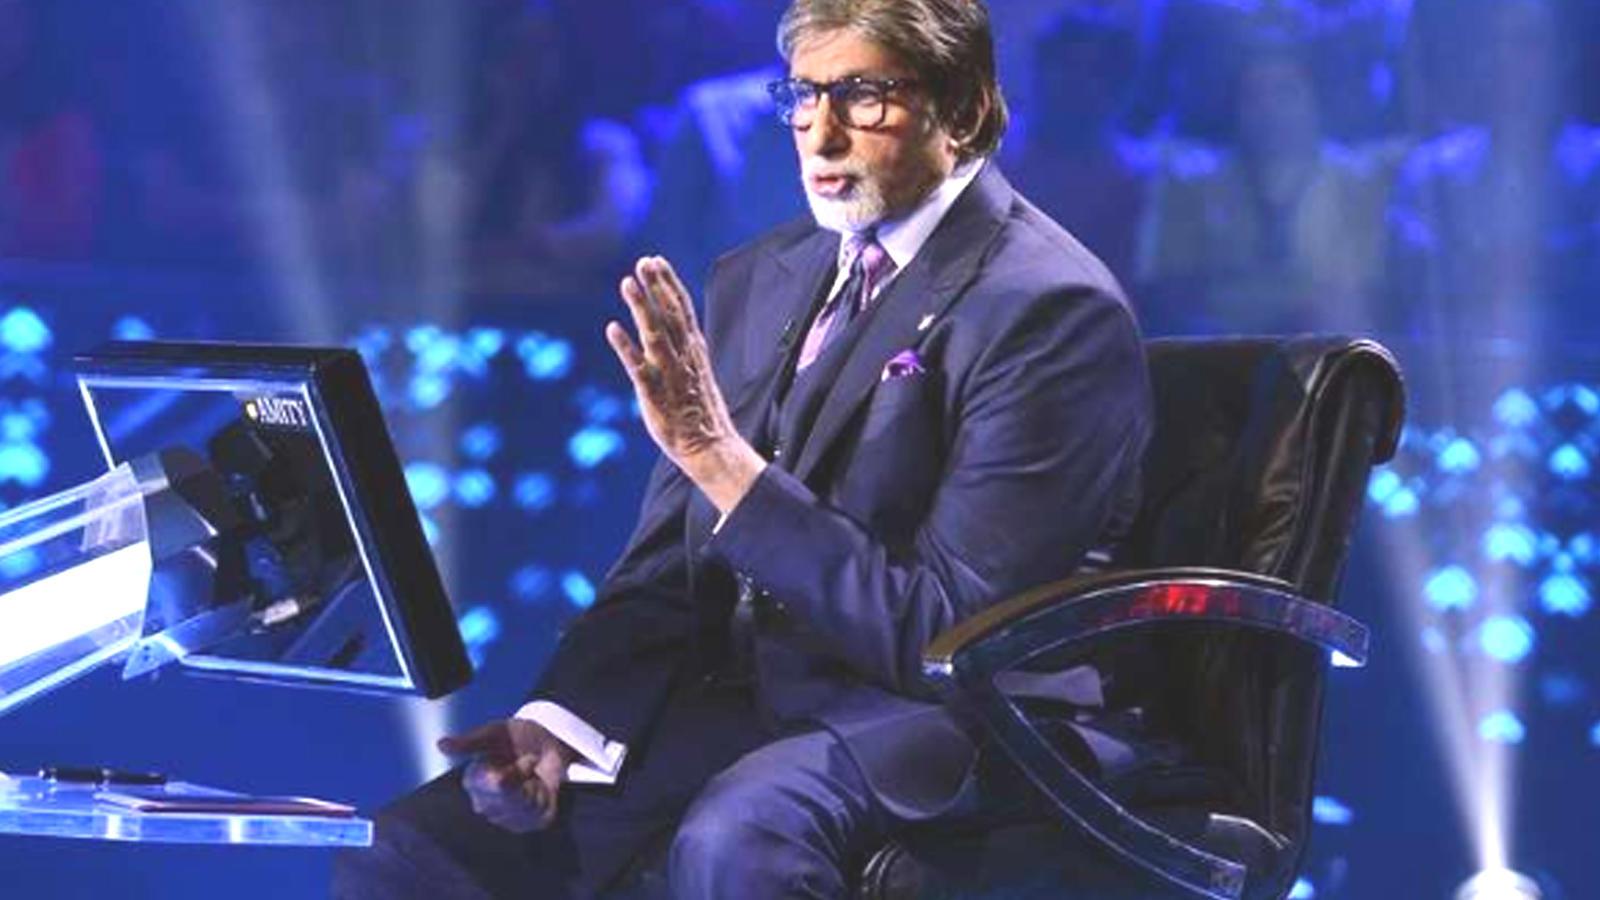 Amitabh Bachchan reveals how 'Kaun Banega Crorepati' has changed his life